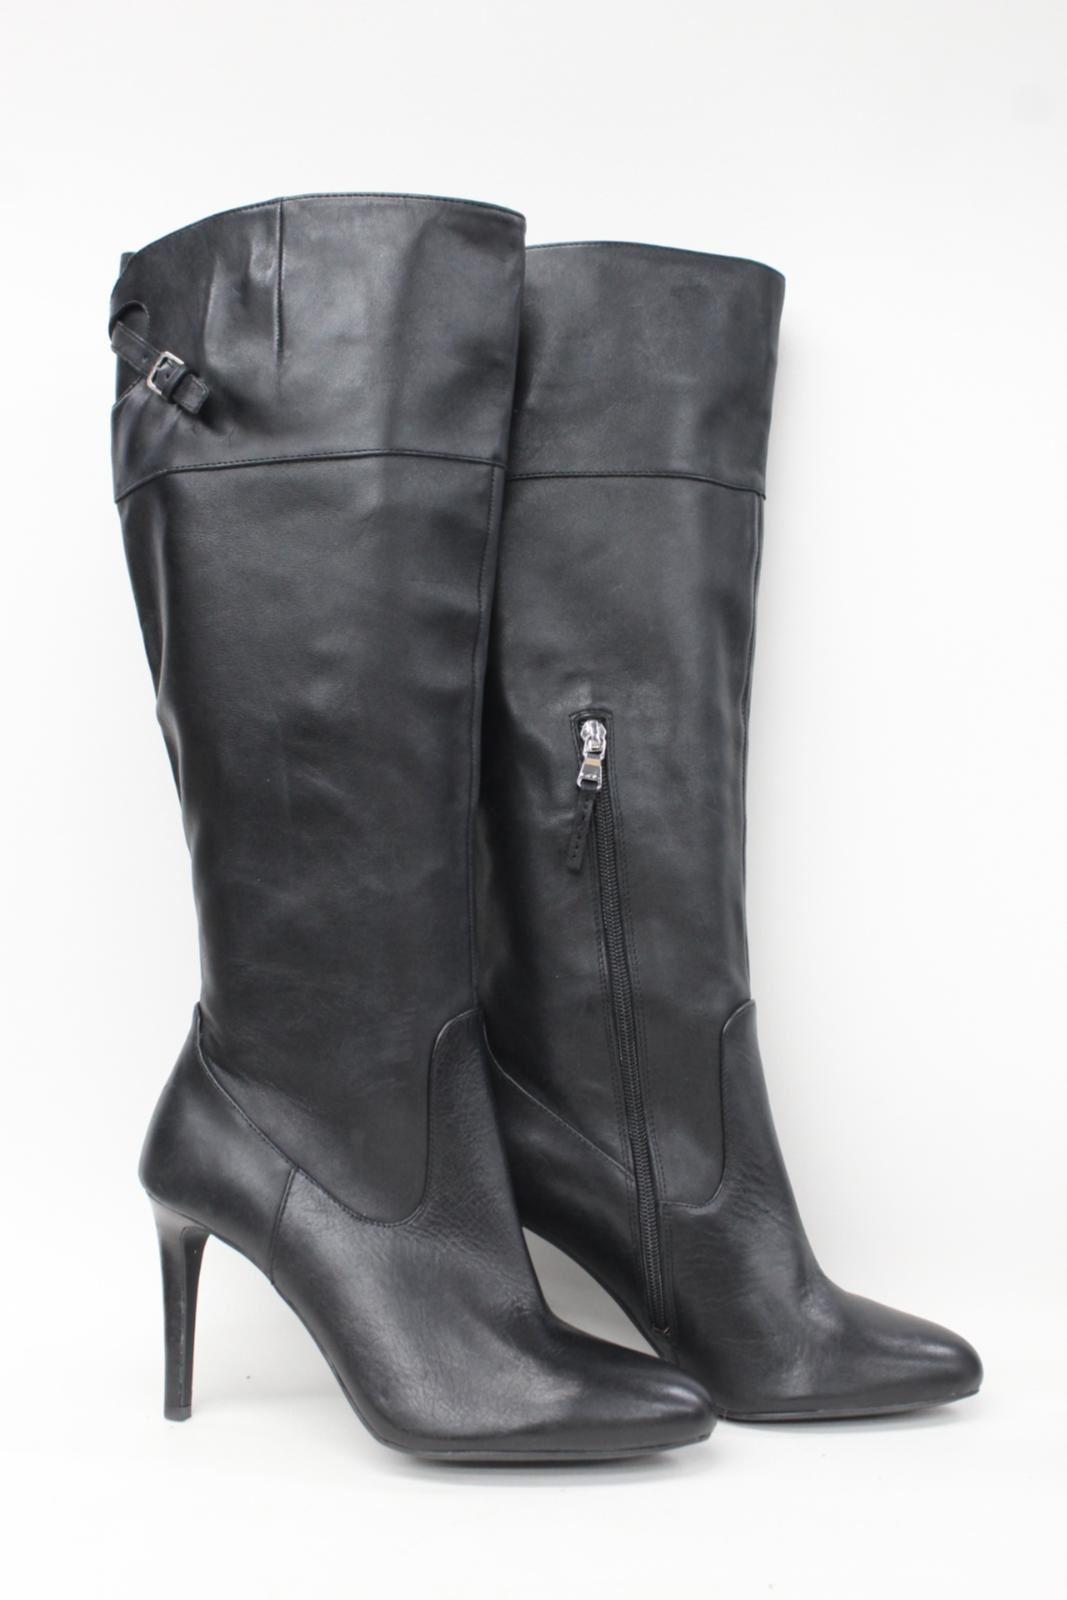 RALPH-LAUREN-Ladies-Black-Leather-Knee-High-Heeled-Boots-Size-UK7-US9B